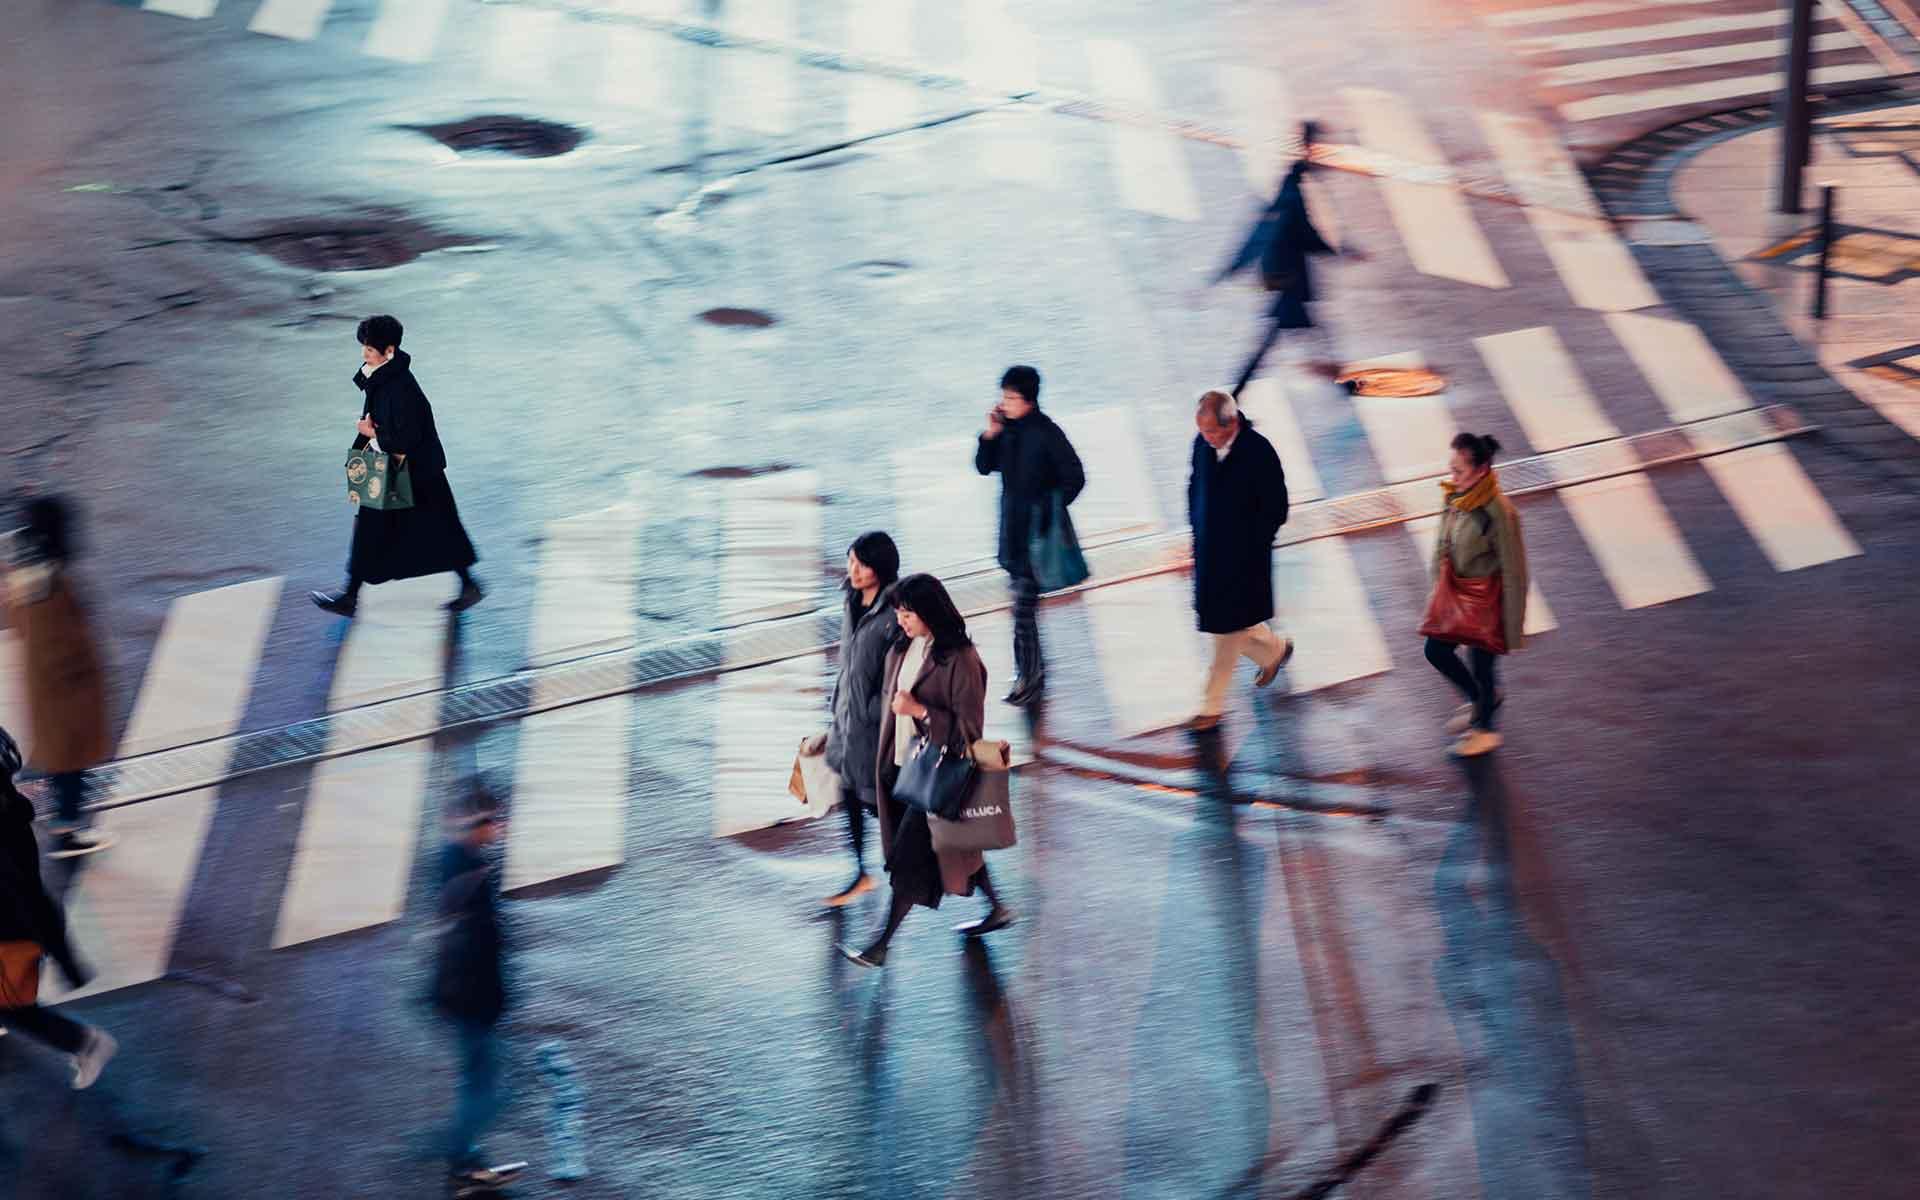 Fußgänger-Übergang